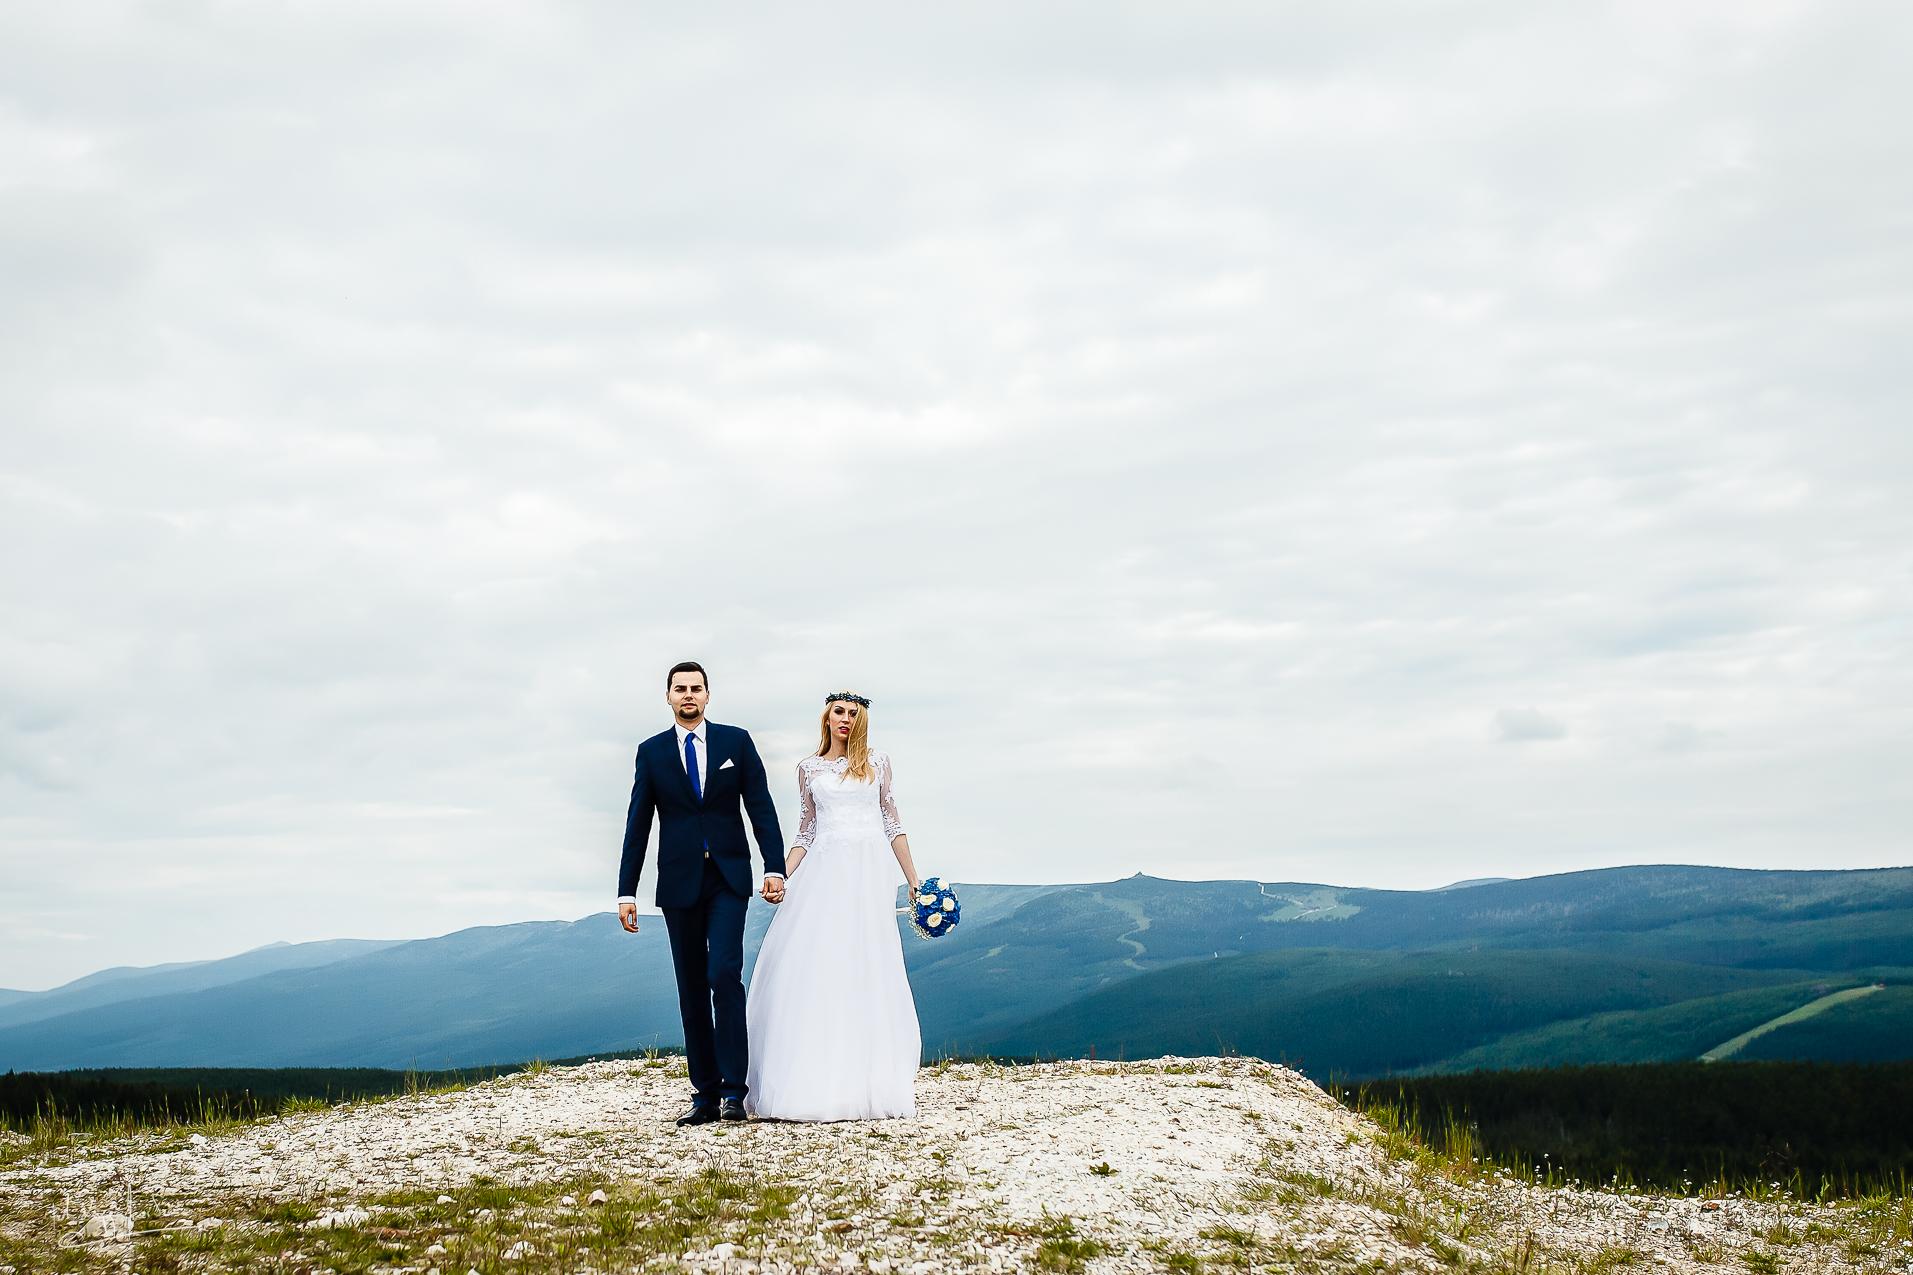 Ślub wesele szklarska poręba 49 Marta & Sławek